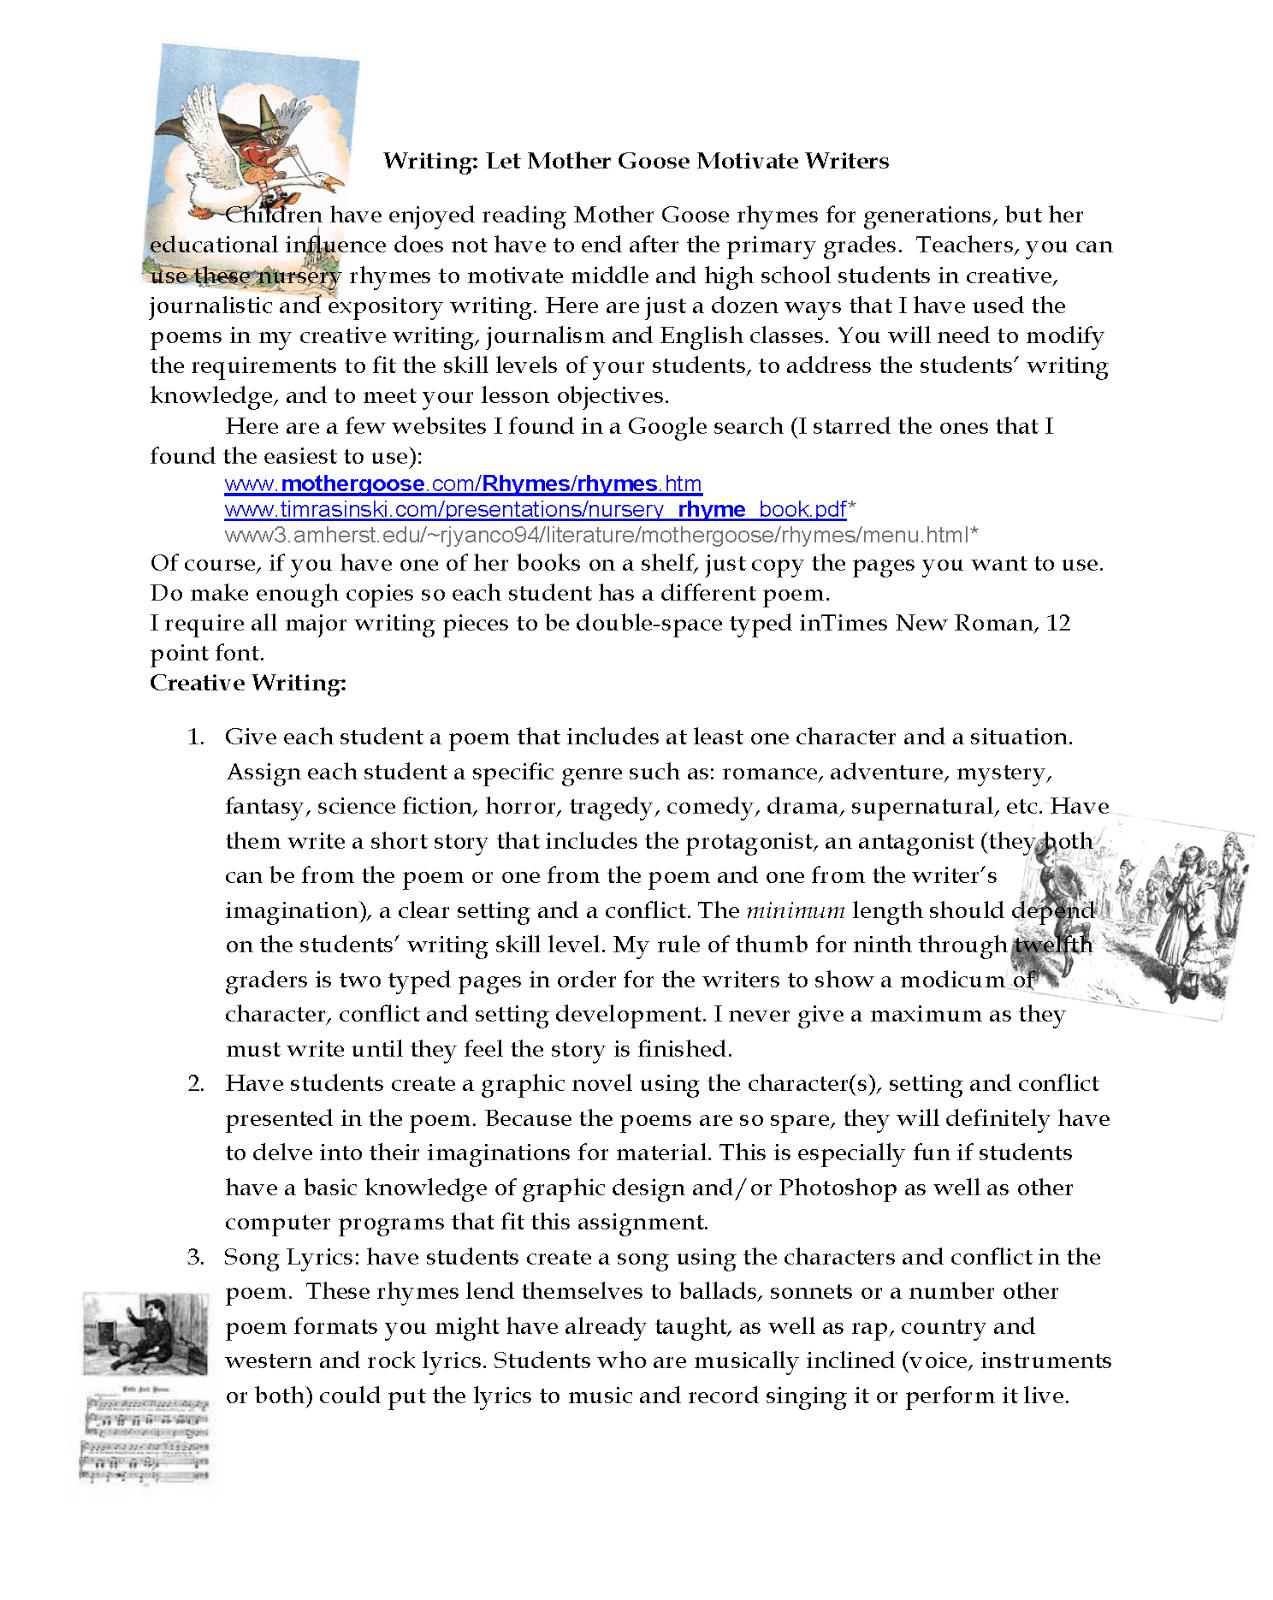 Hirani thesis on discrete exterior calculus